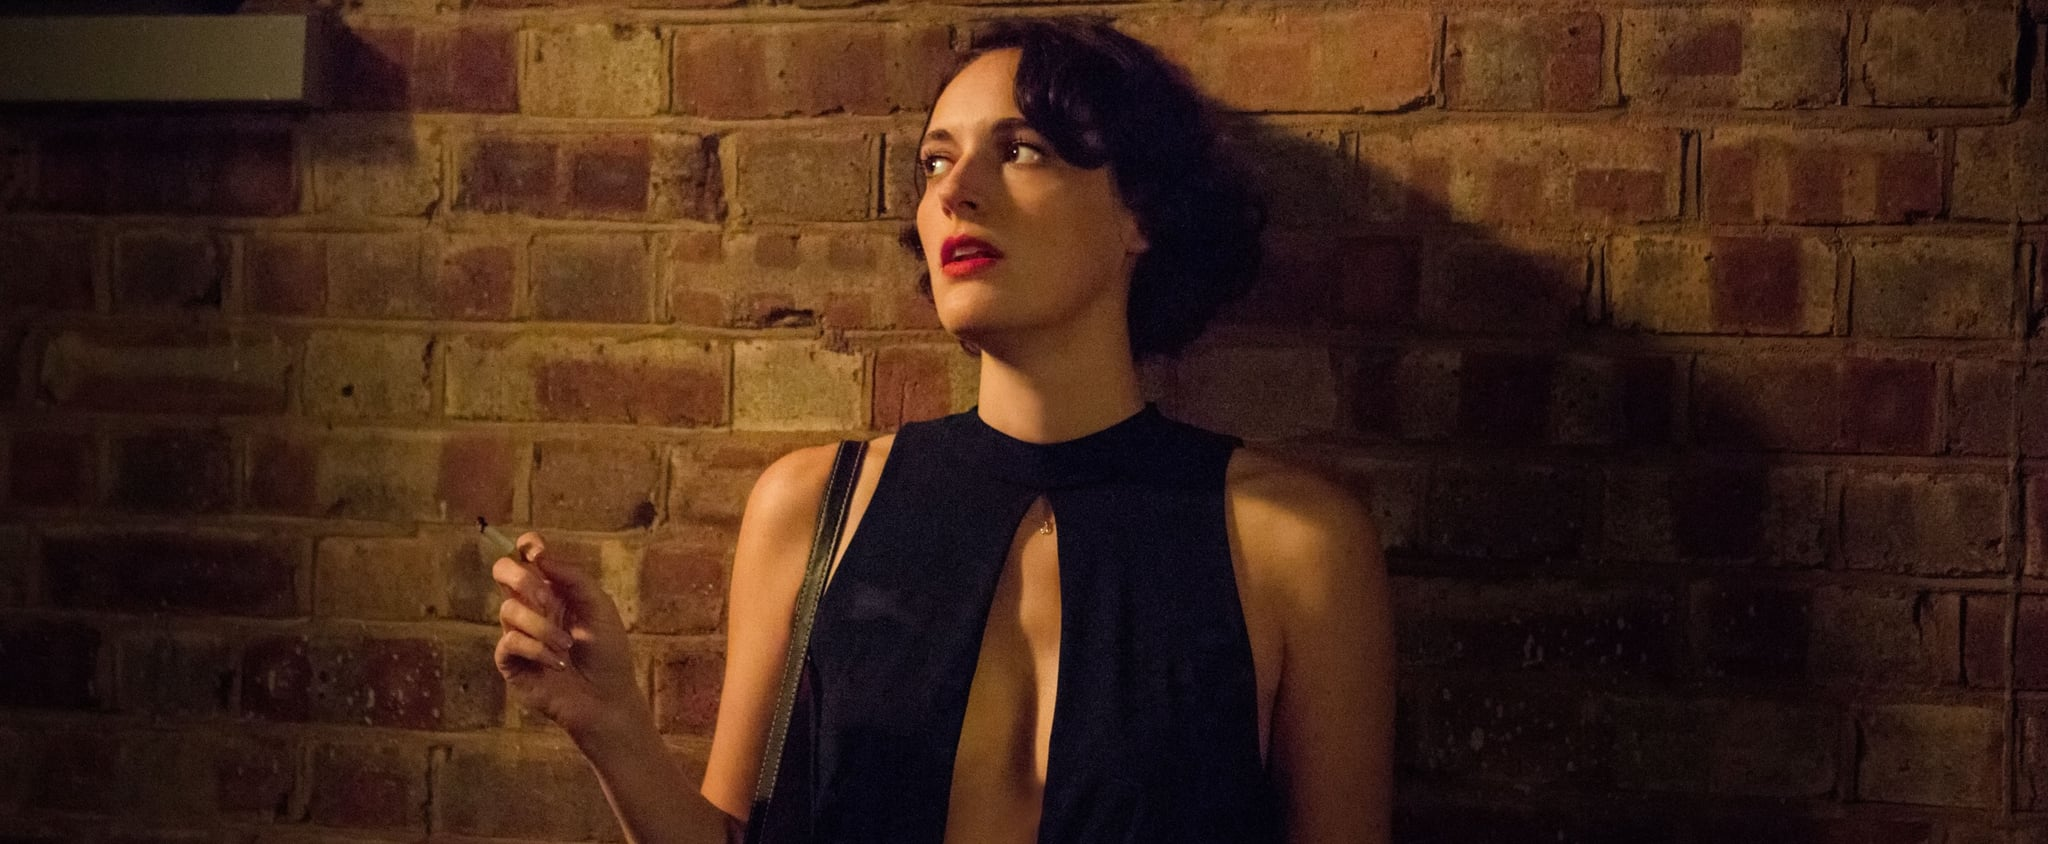 How to Stream Phoebe Waller-Bridge's Fleabag Stage Show